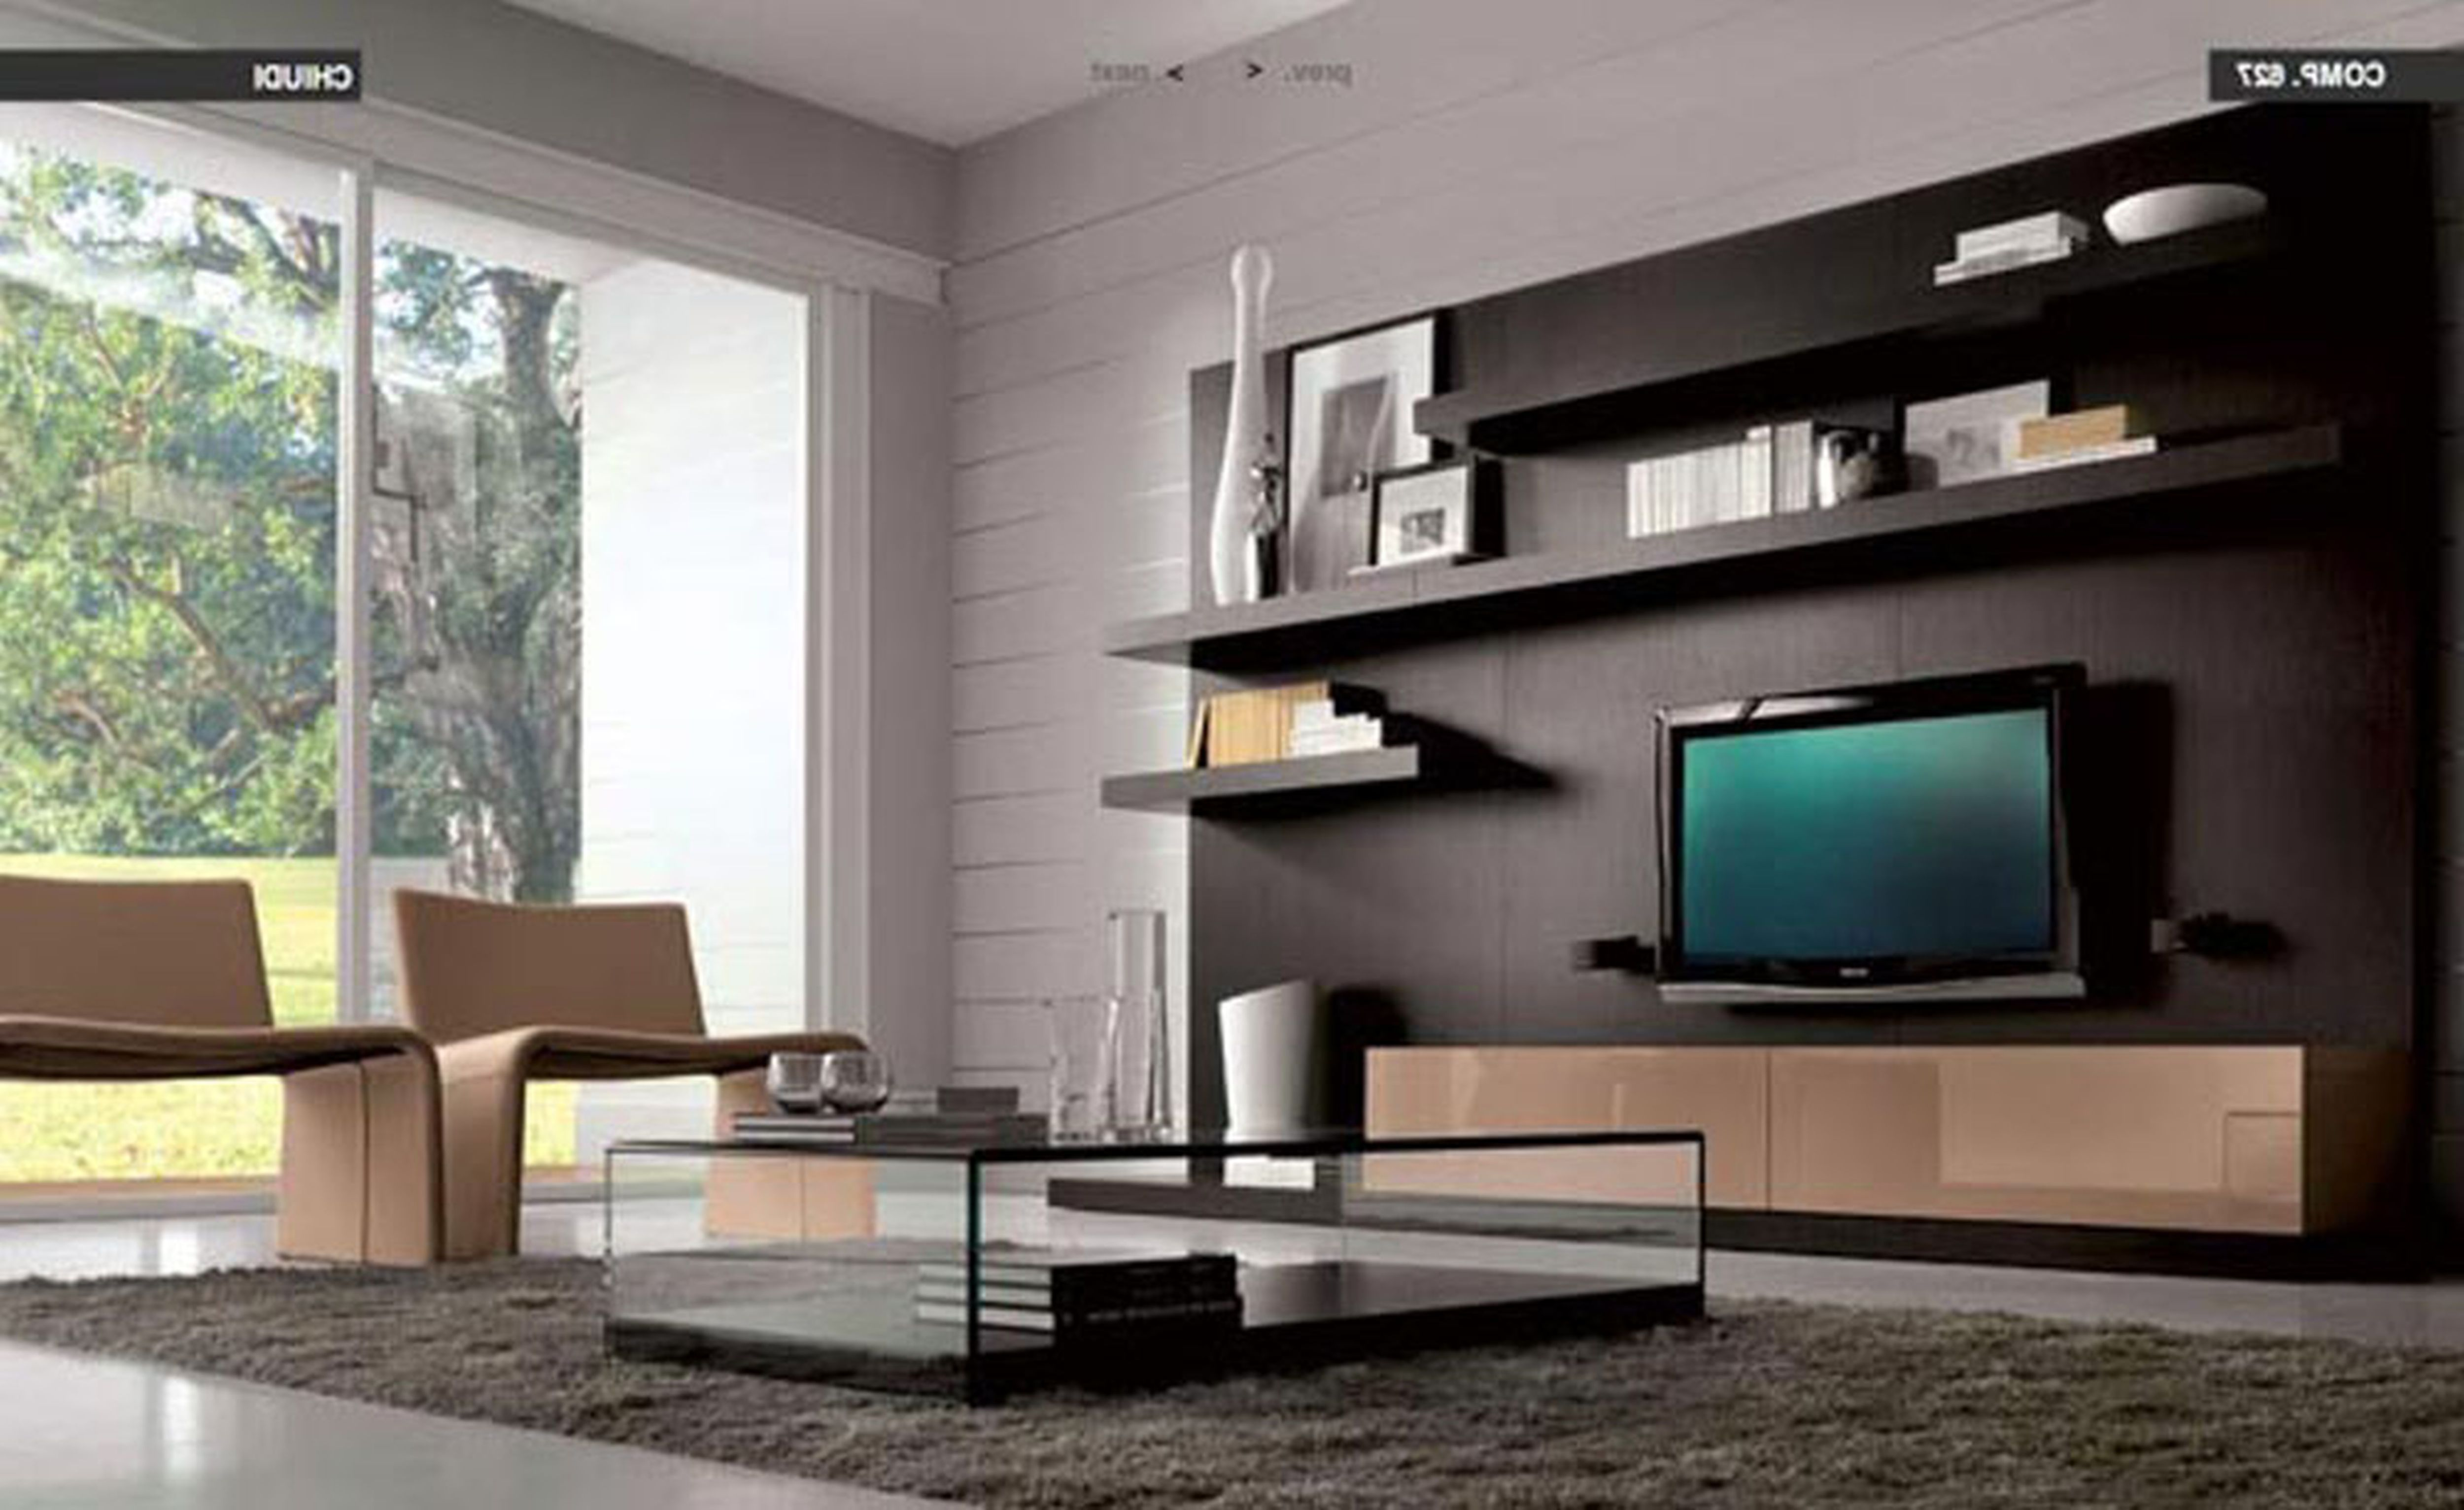 Best Images About Home Interior Design On Pinterest Modern - Home decor interior design